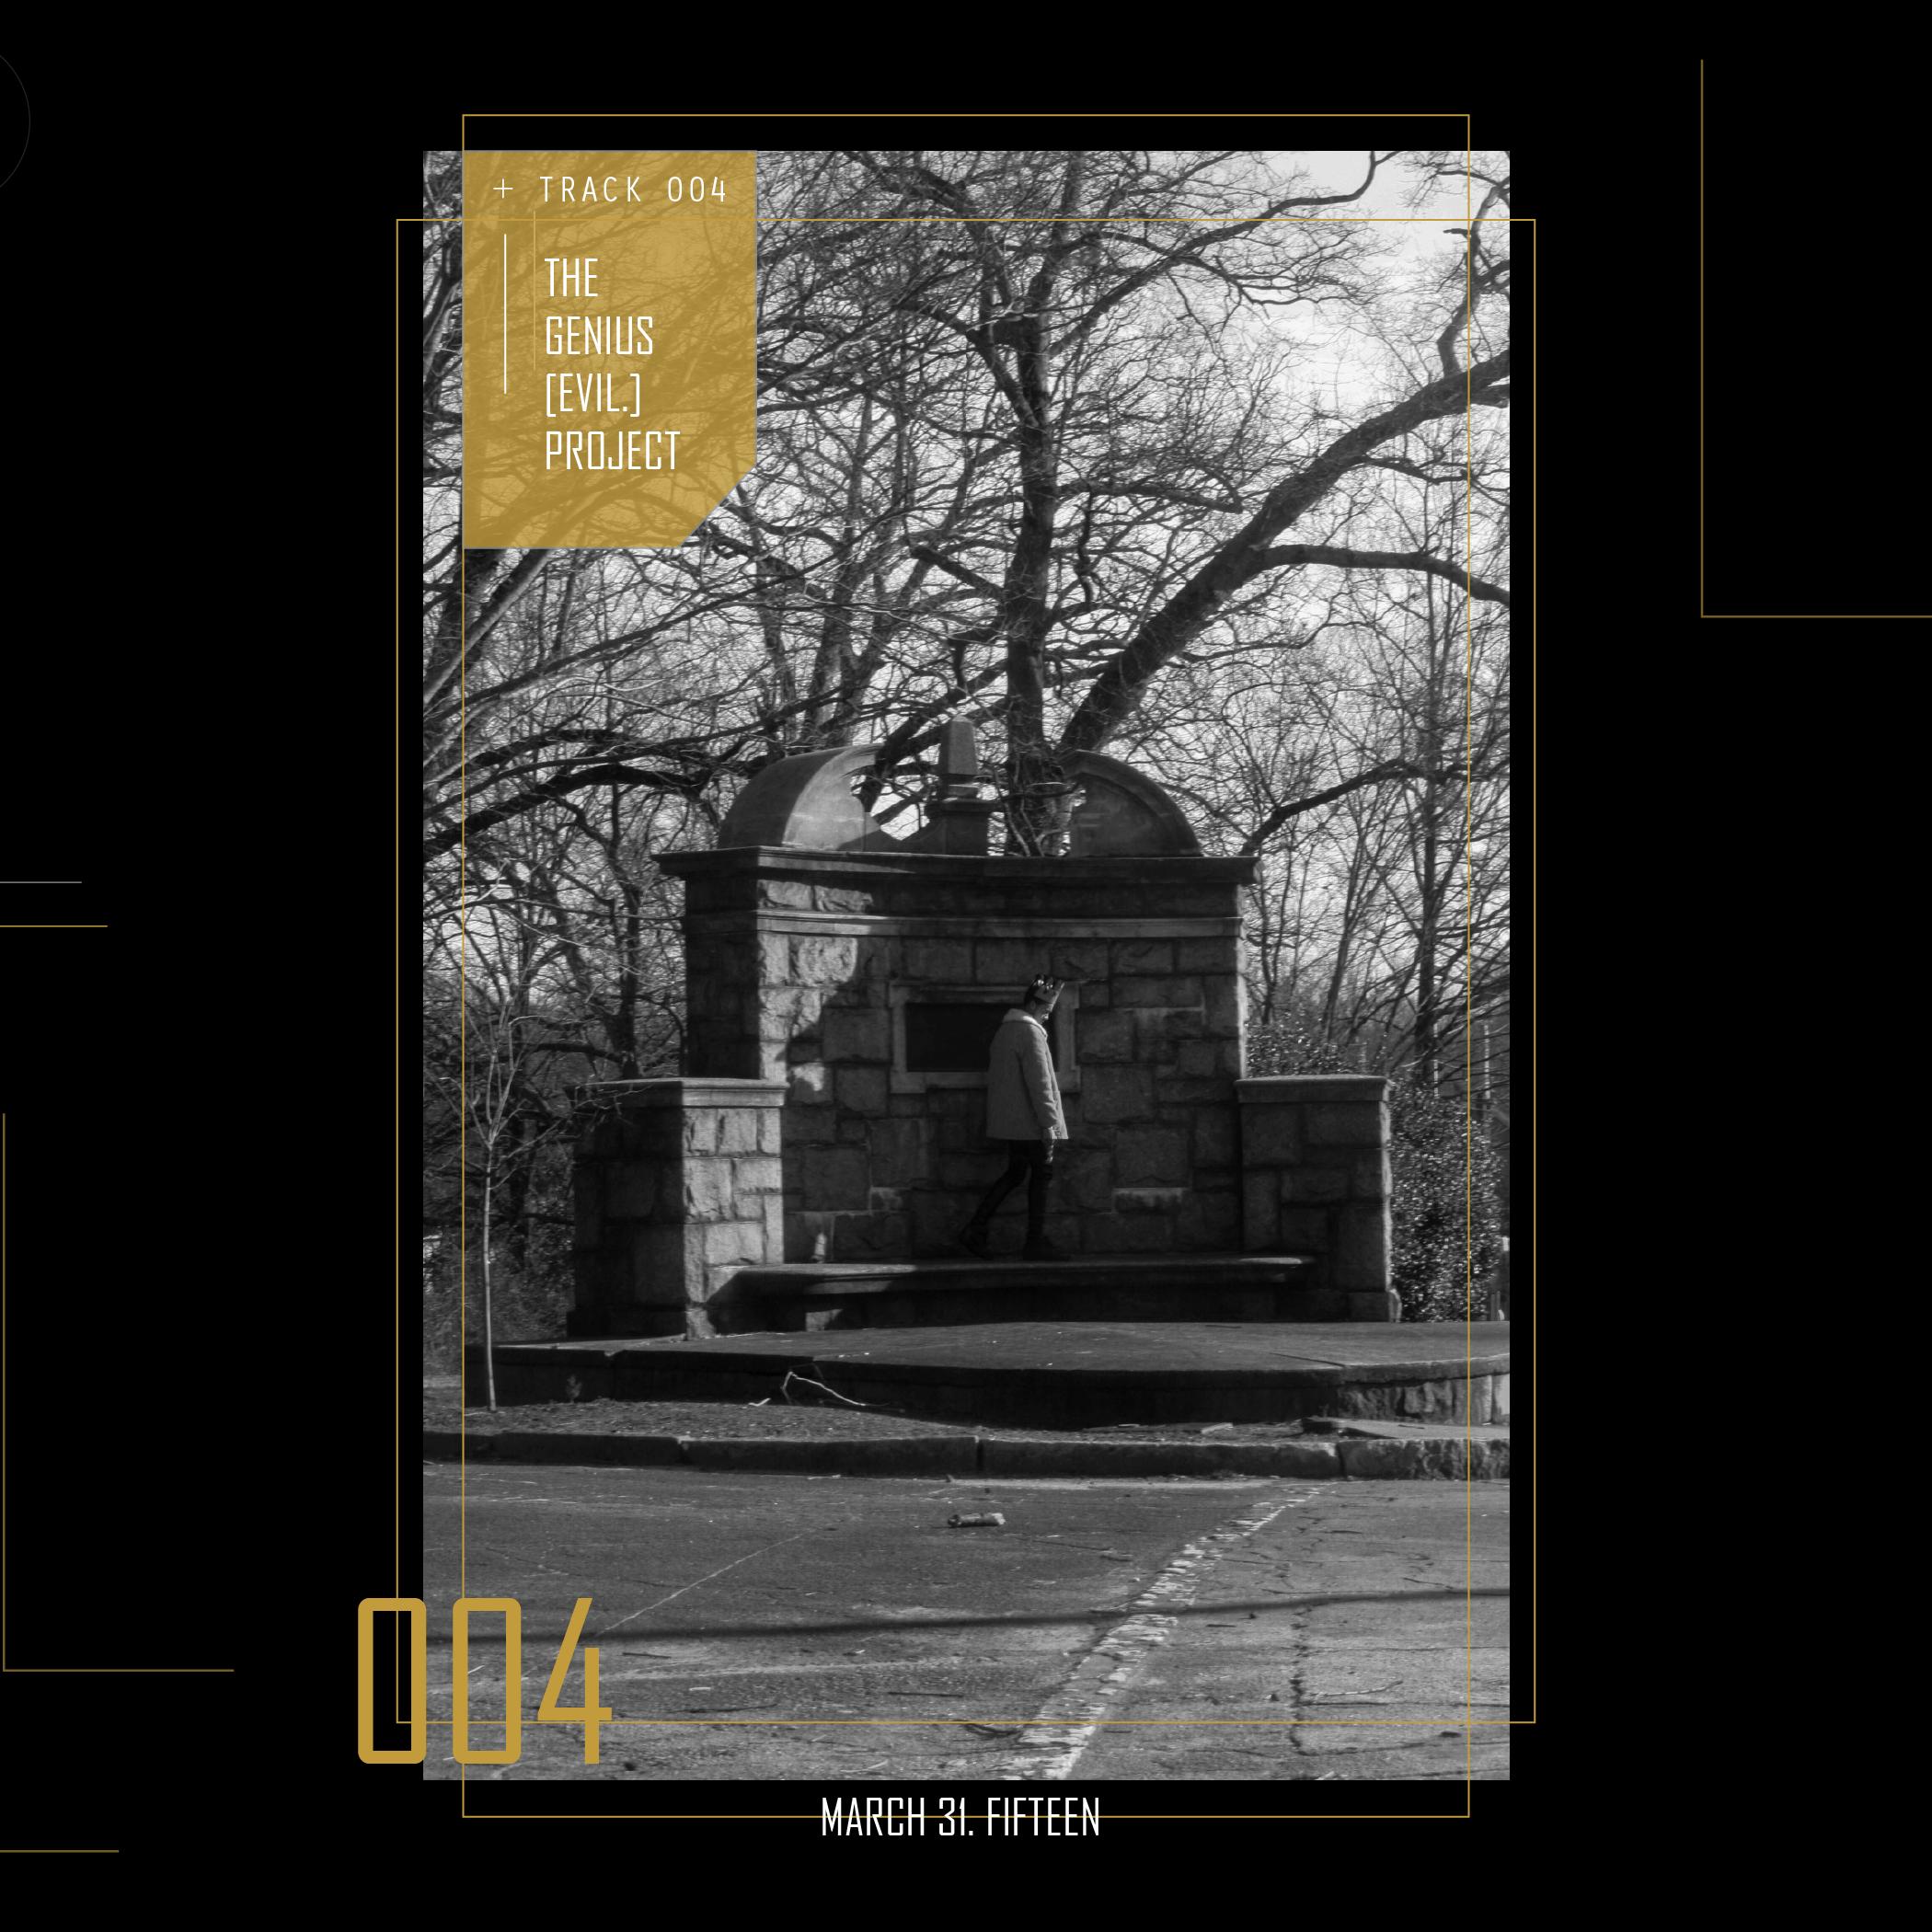 TheGeniusEvilProject-DigitalPromo-CooleySavant-IG-06.png